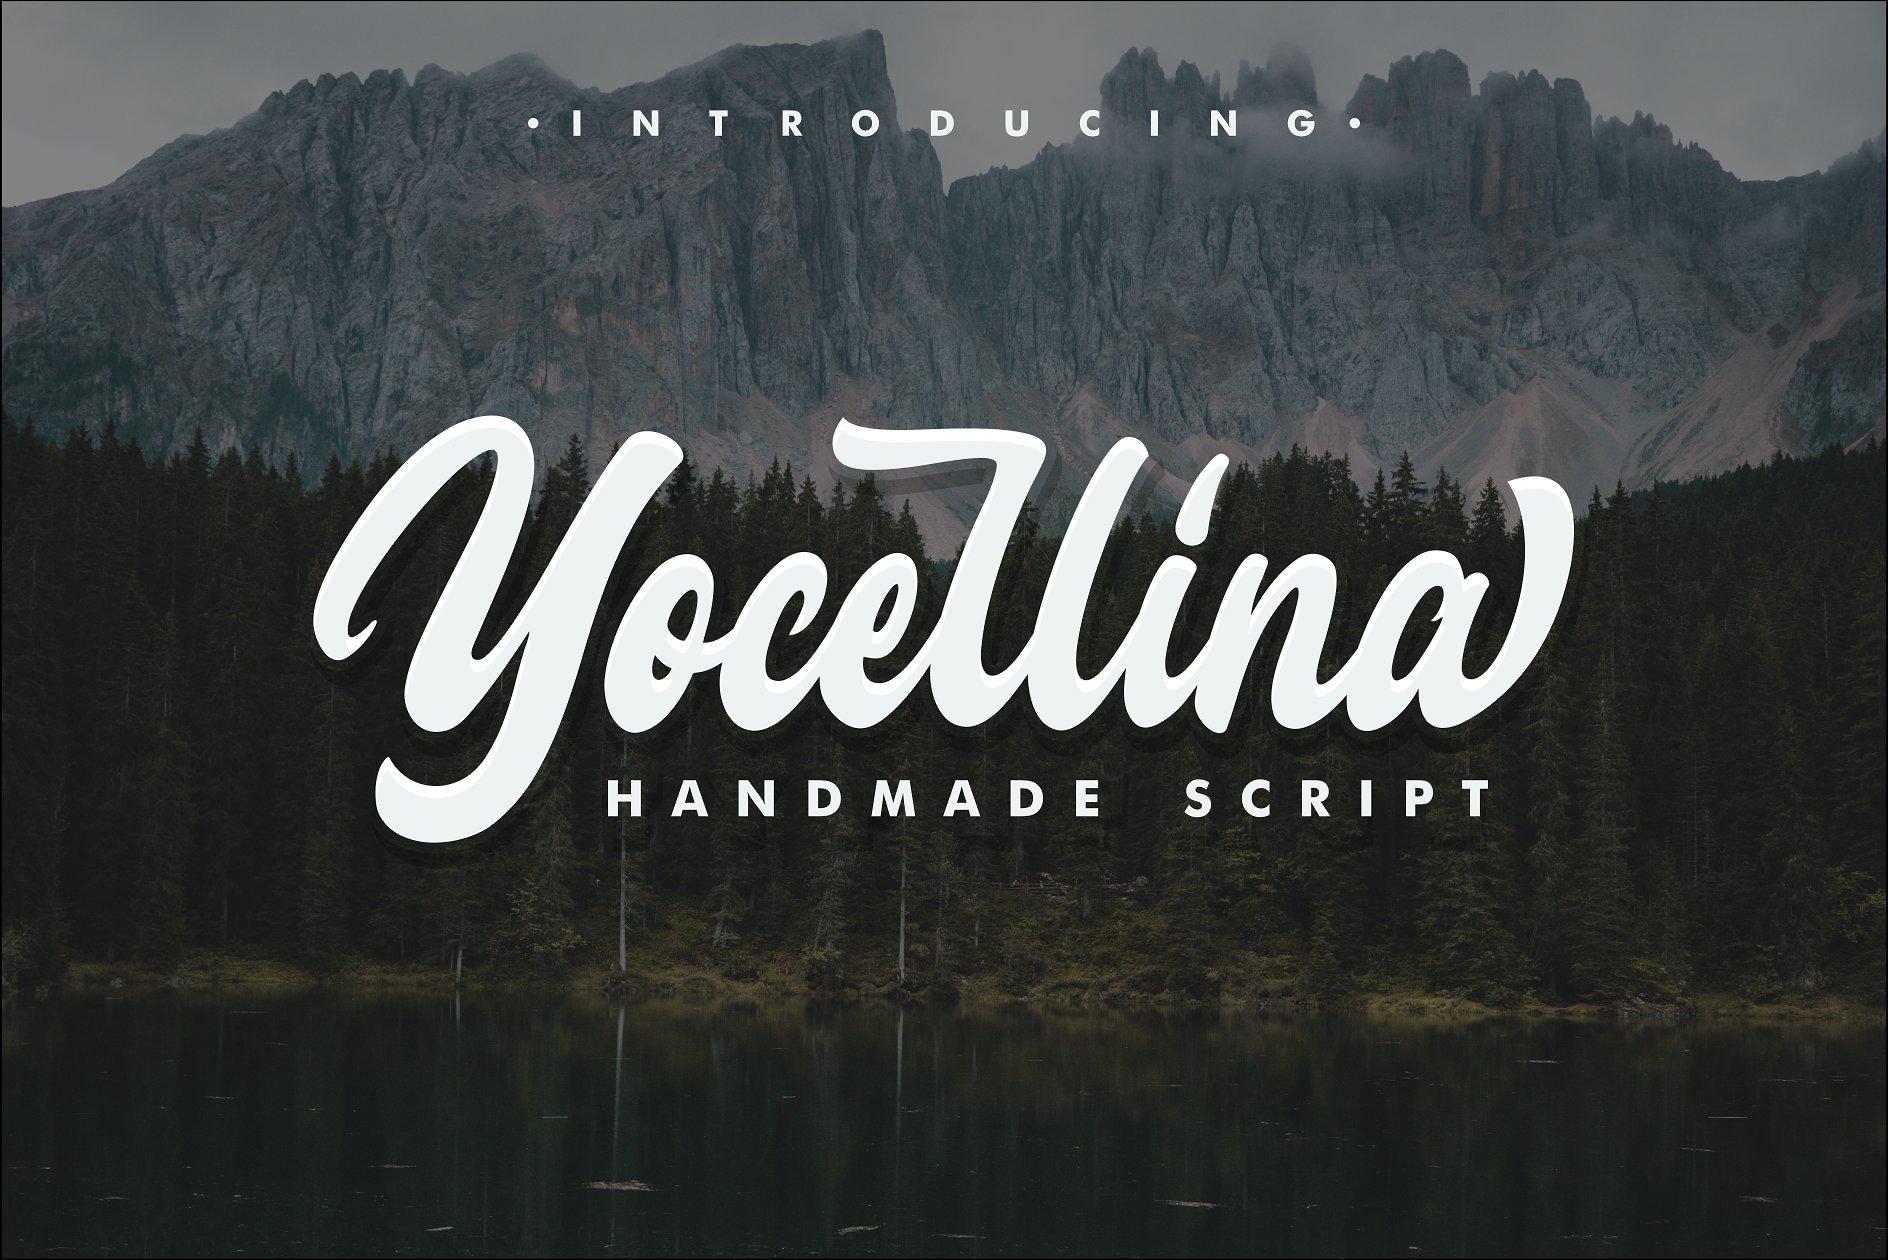 https://fontclarity.com/wp-content/uploads/2019/09/yocellina-script-font-download-0.jpg Free Download